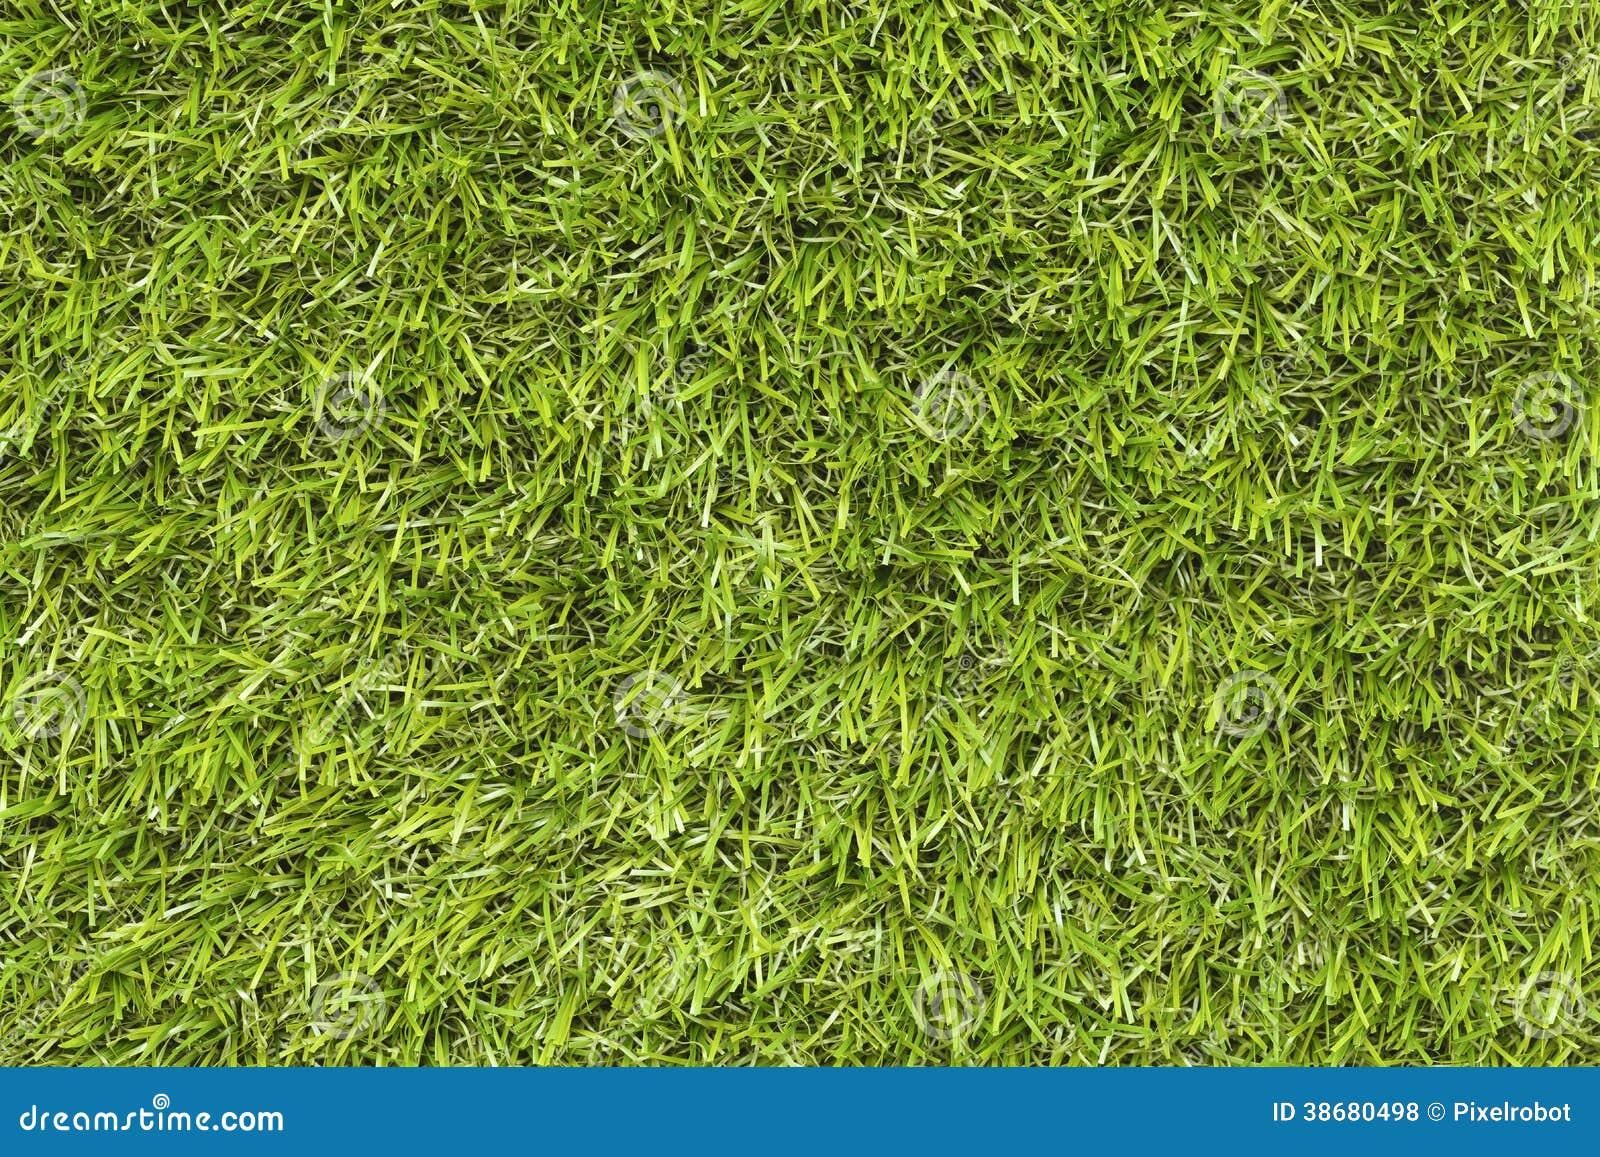 fausse herbe photos libres de droits image 38680498. Black Bedroom Furniture Sets. Home Design Ideas